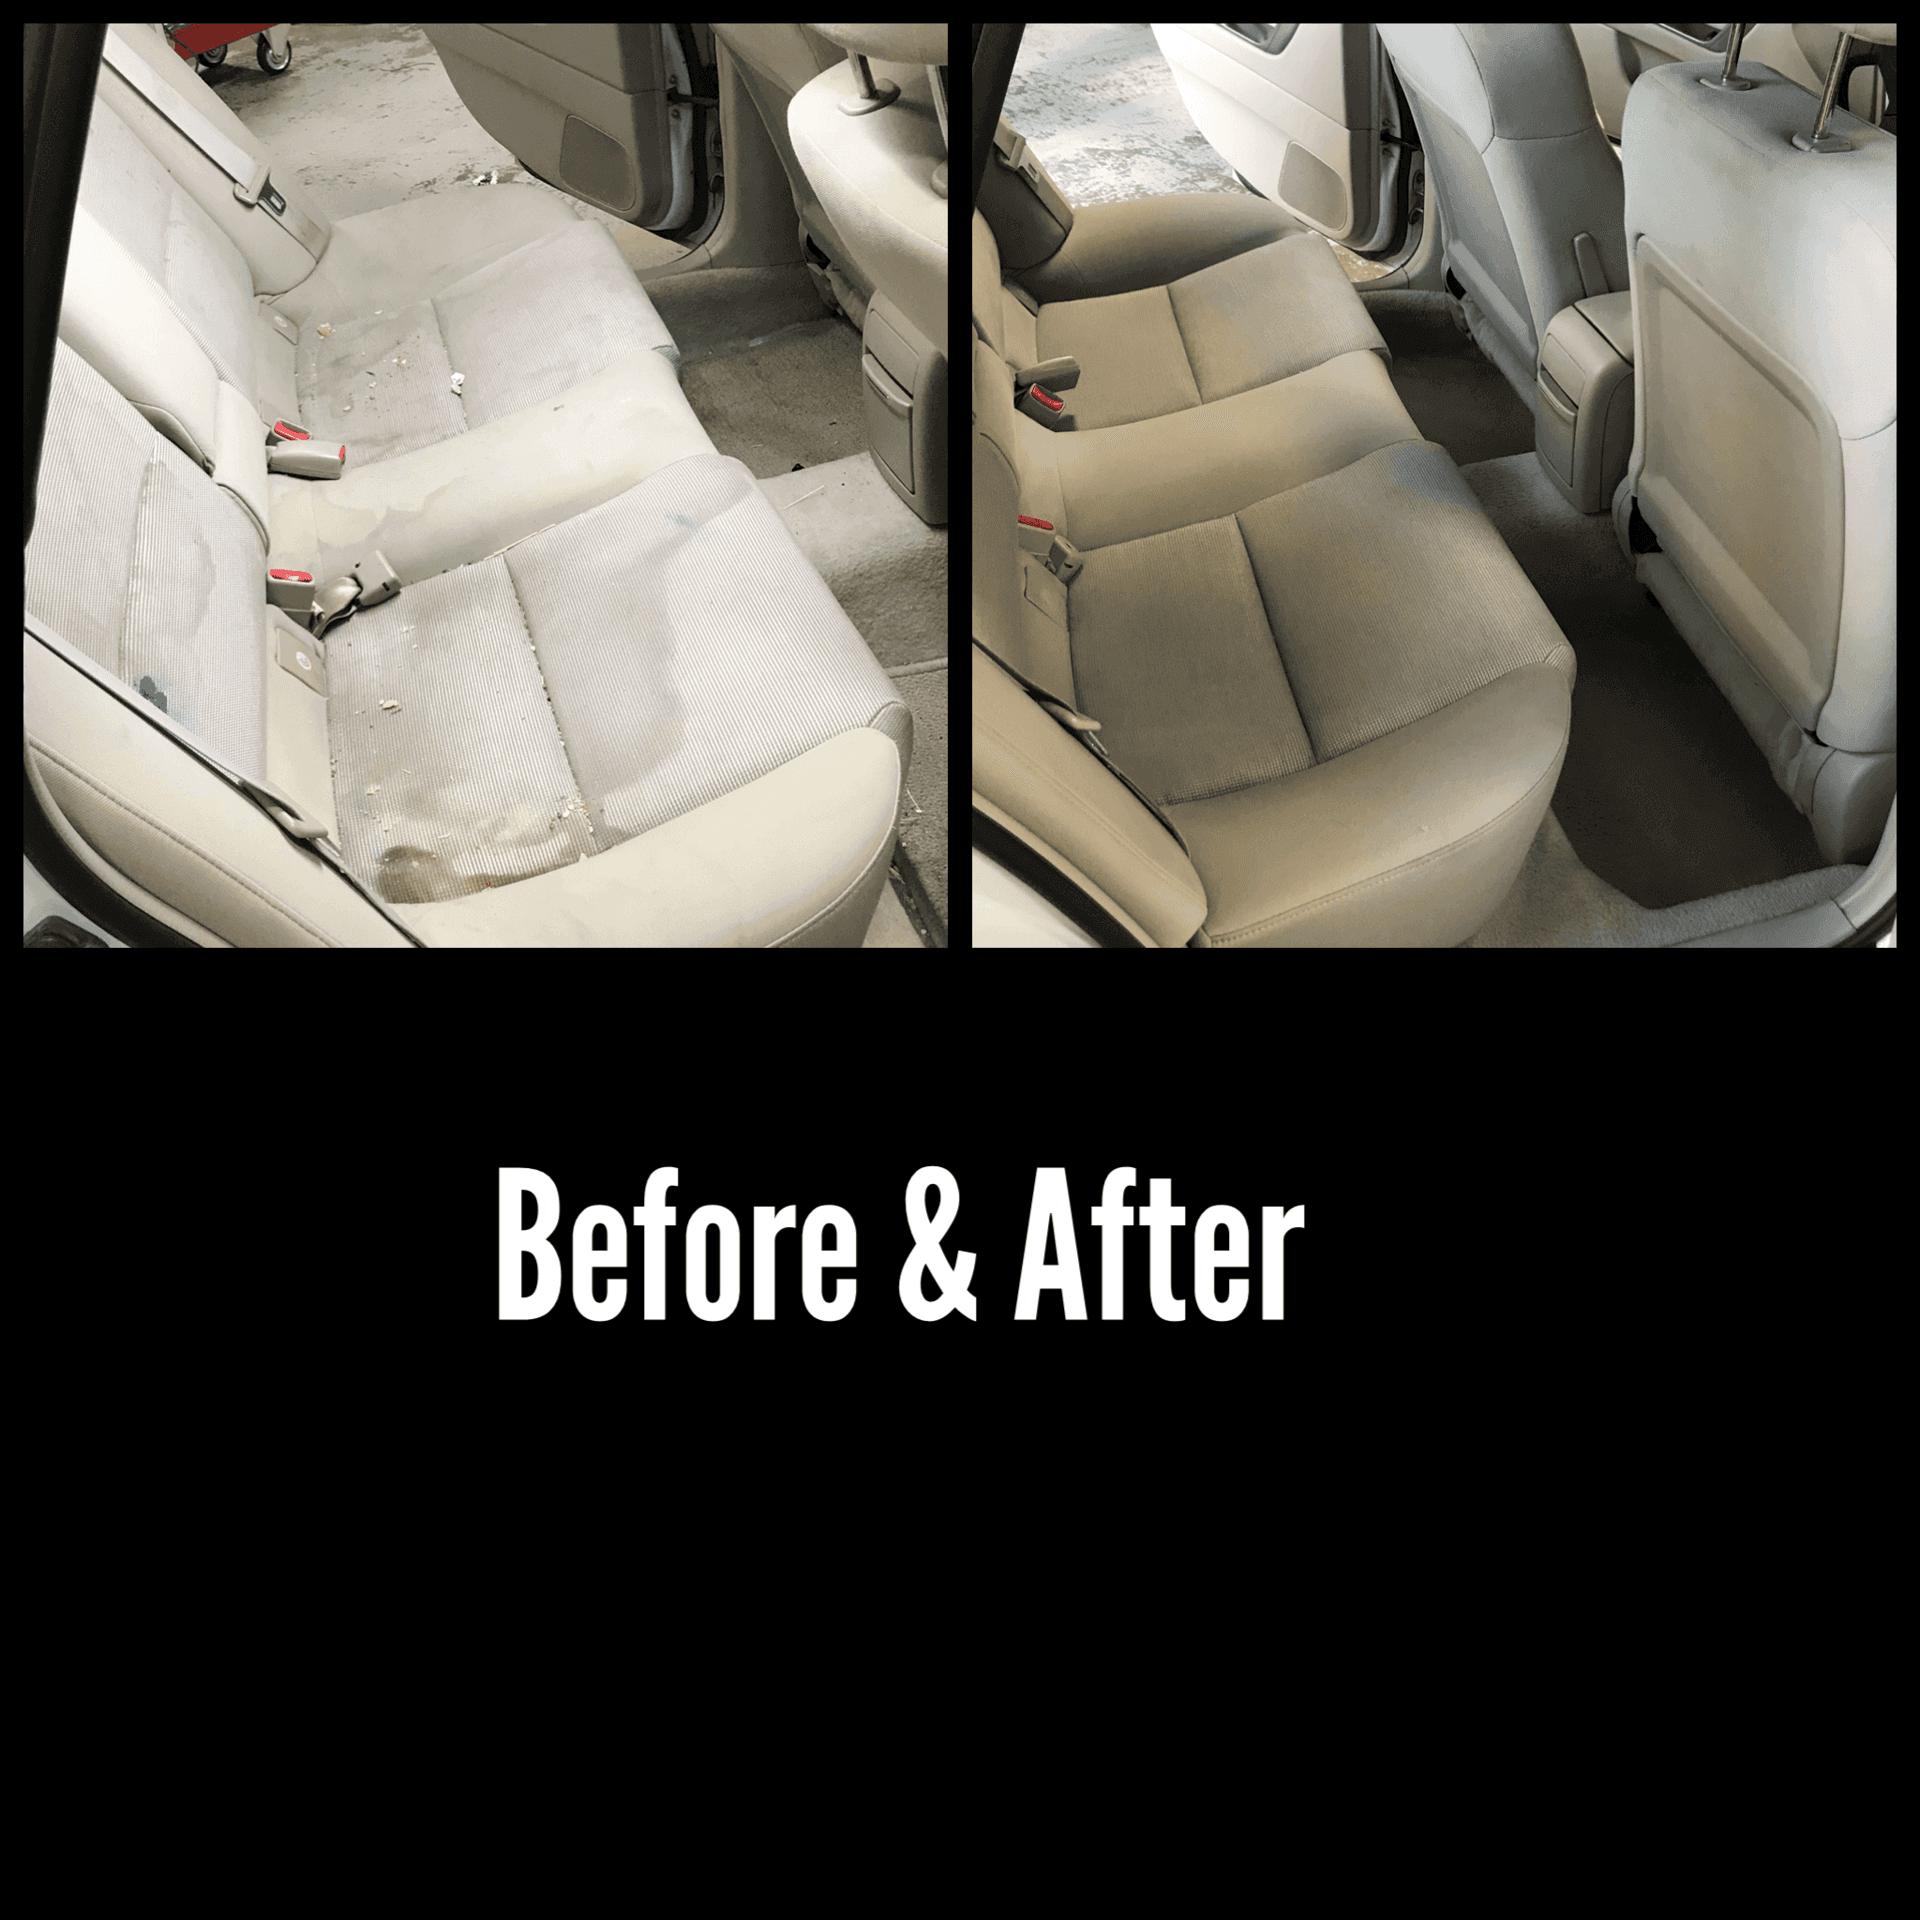 Interior Car Detailing Midland Tx: Auto Detailing Services